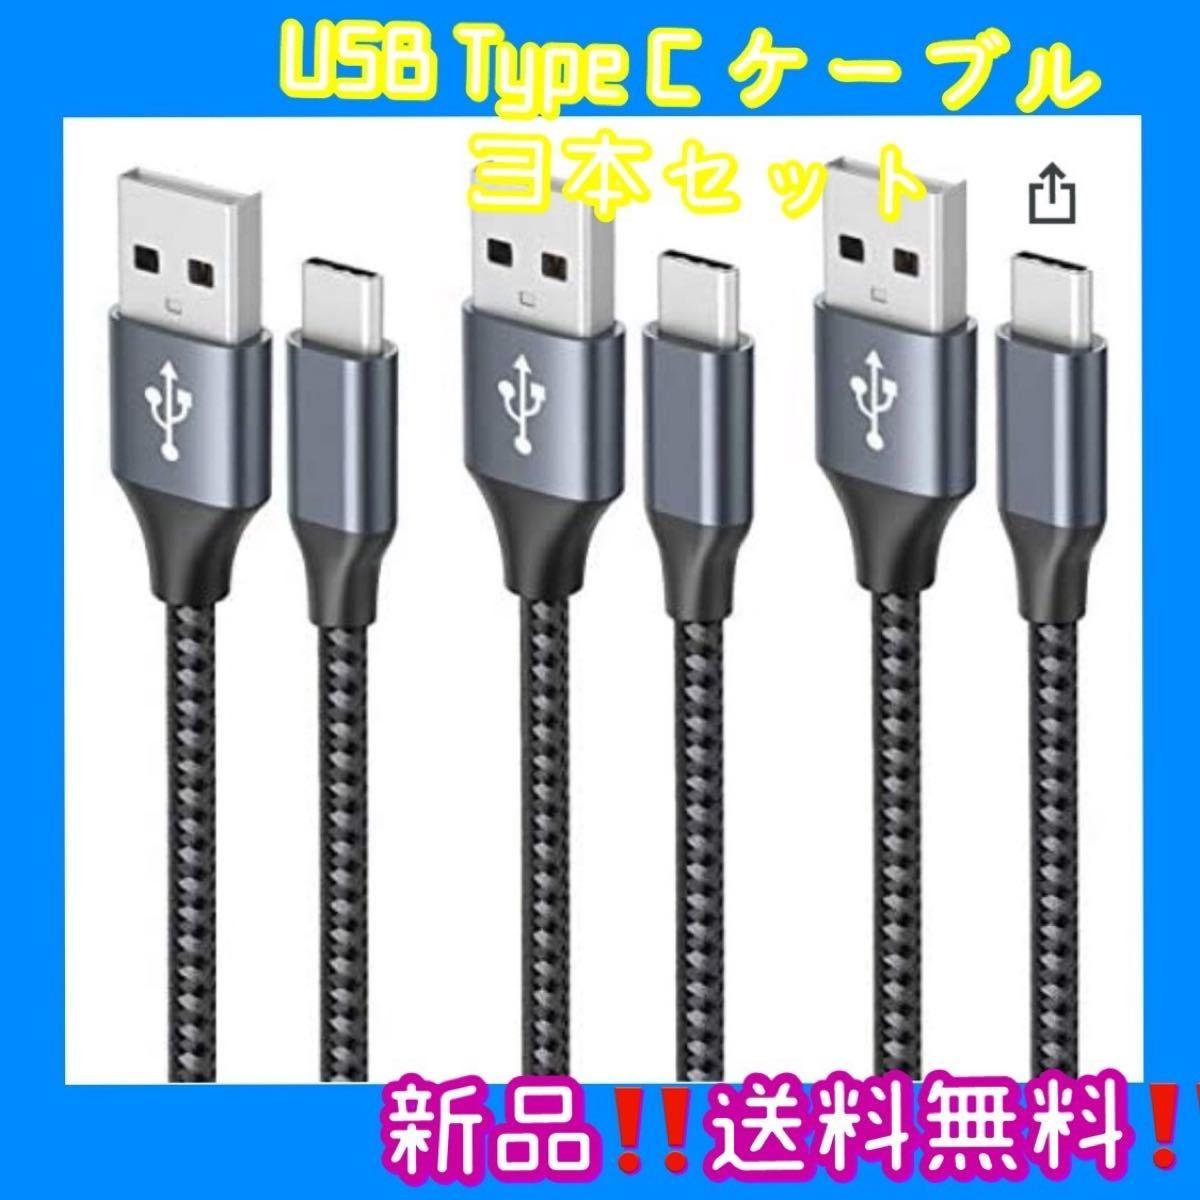 USB Type C ケーブル 【3本セット 1m/1m/2m】3A 急速充電